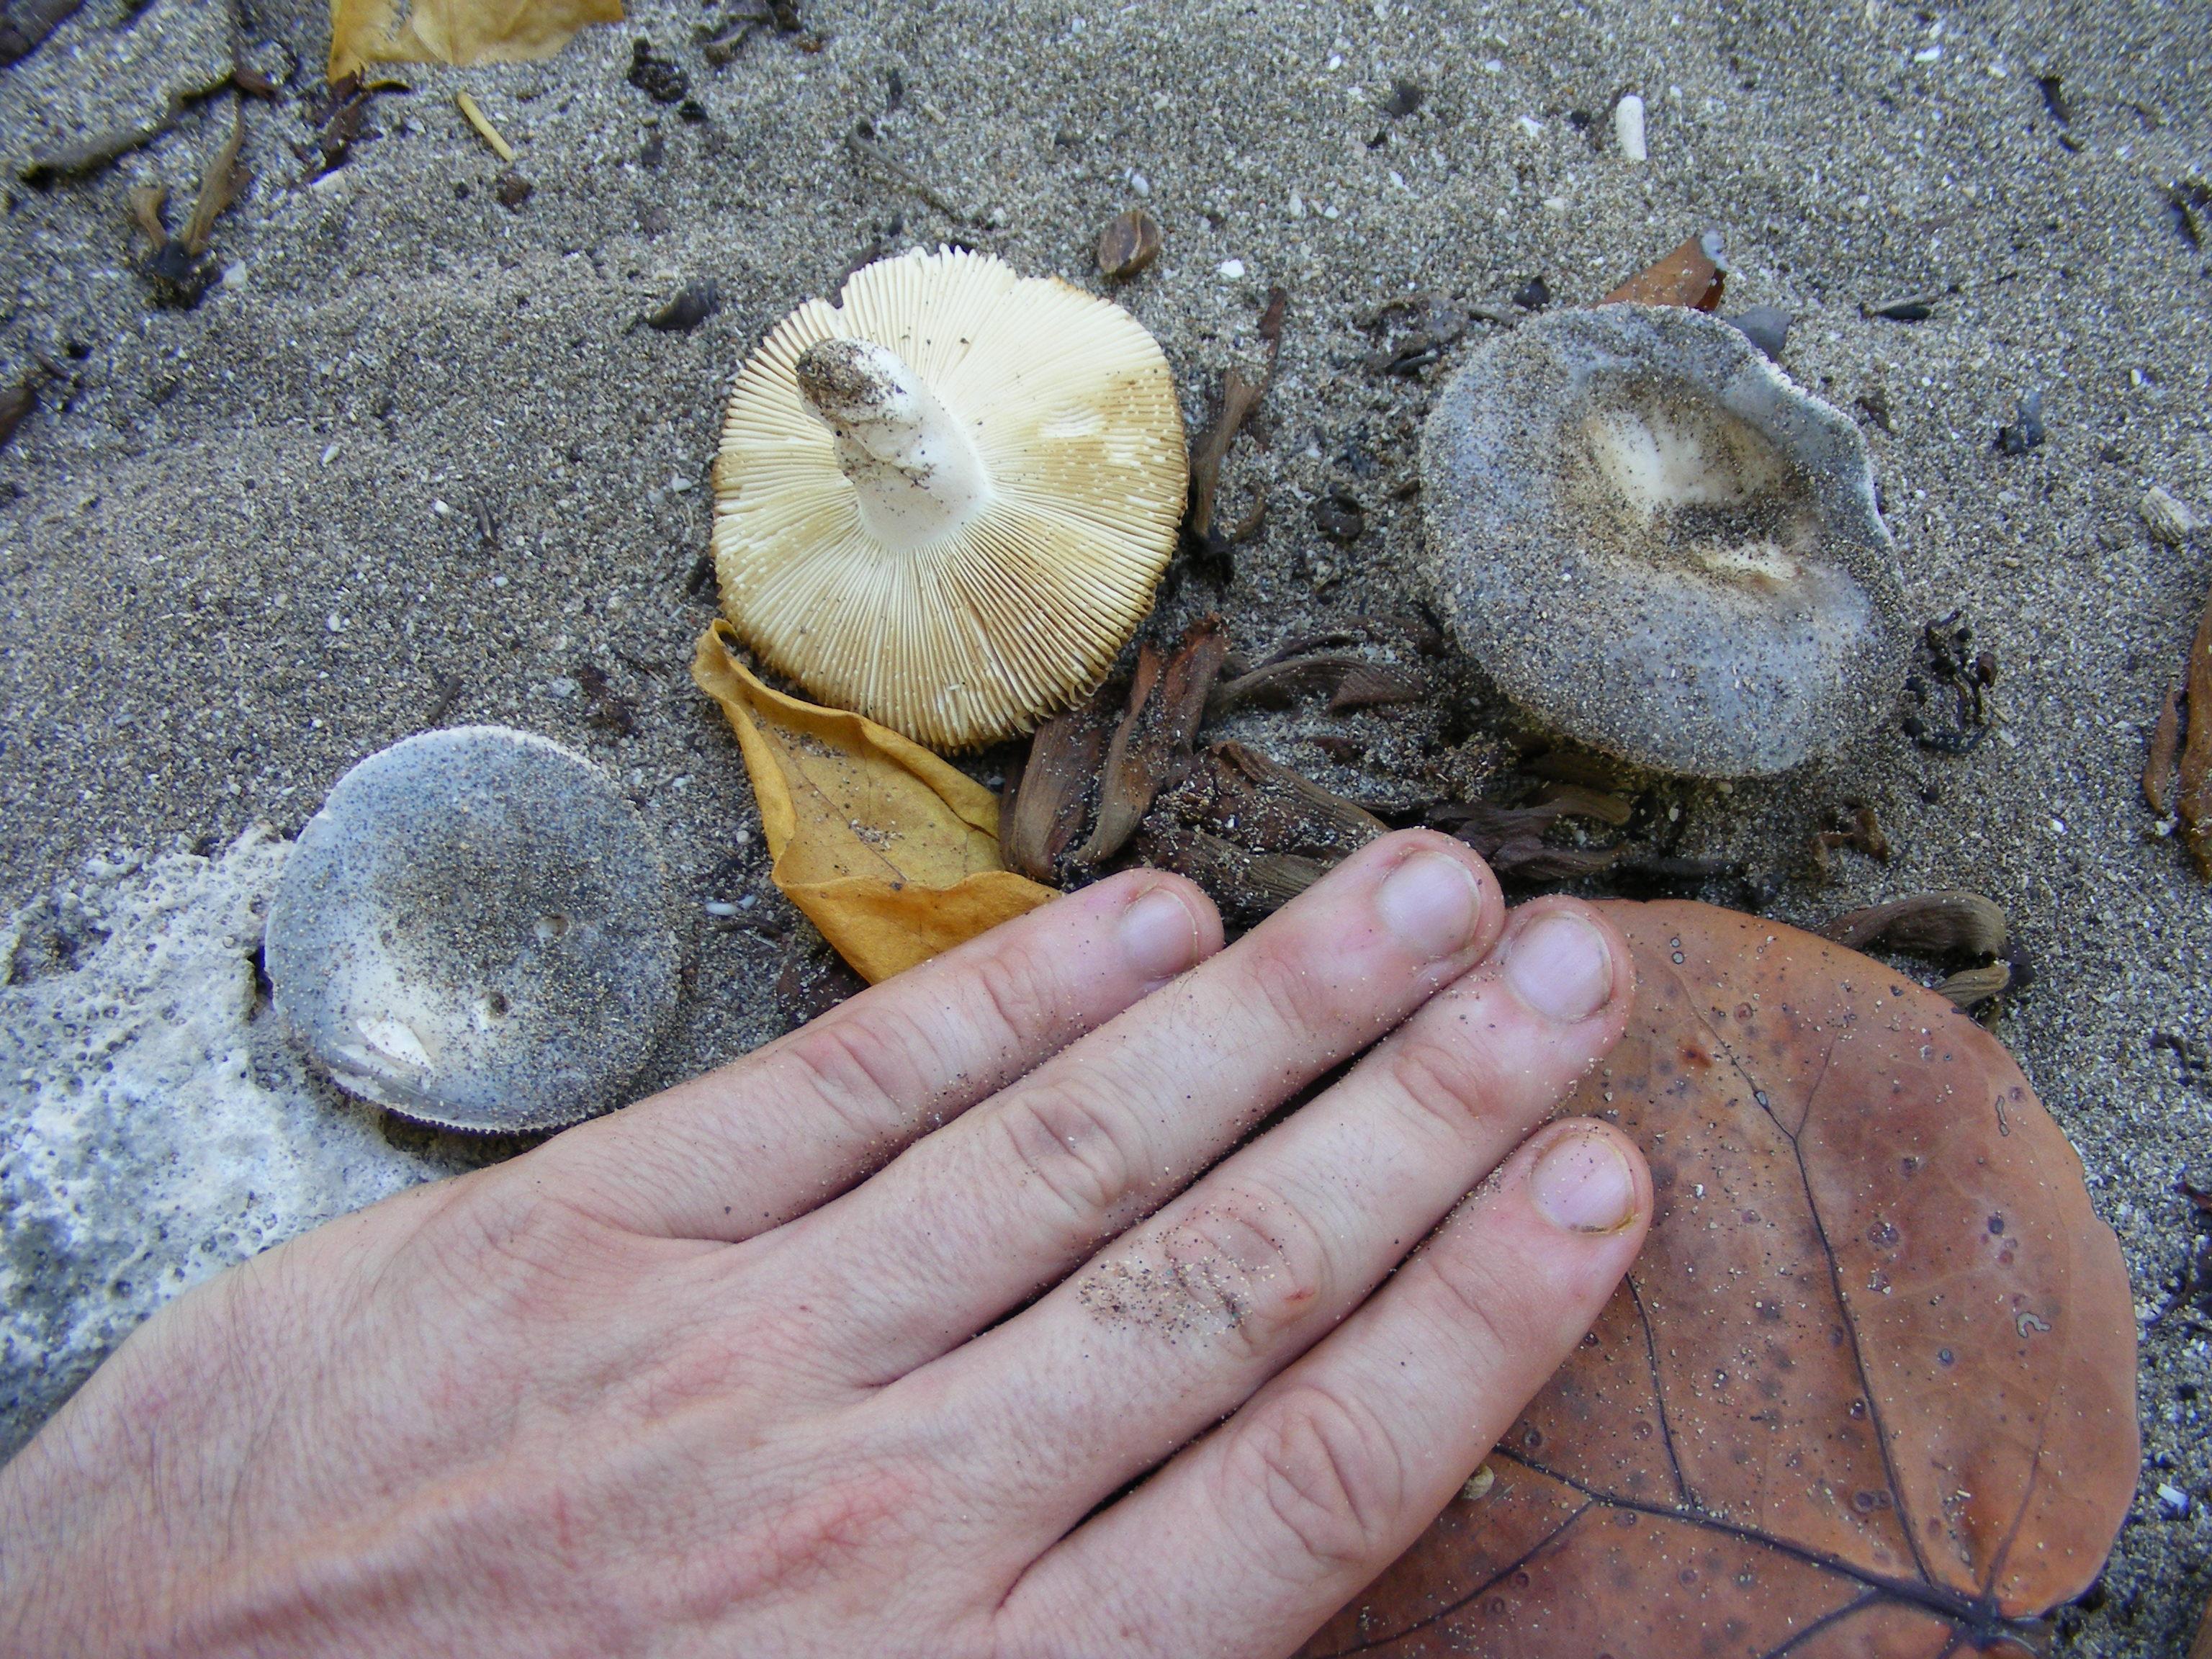 Russula cremeolilacina image